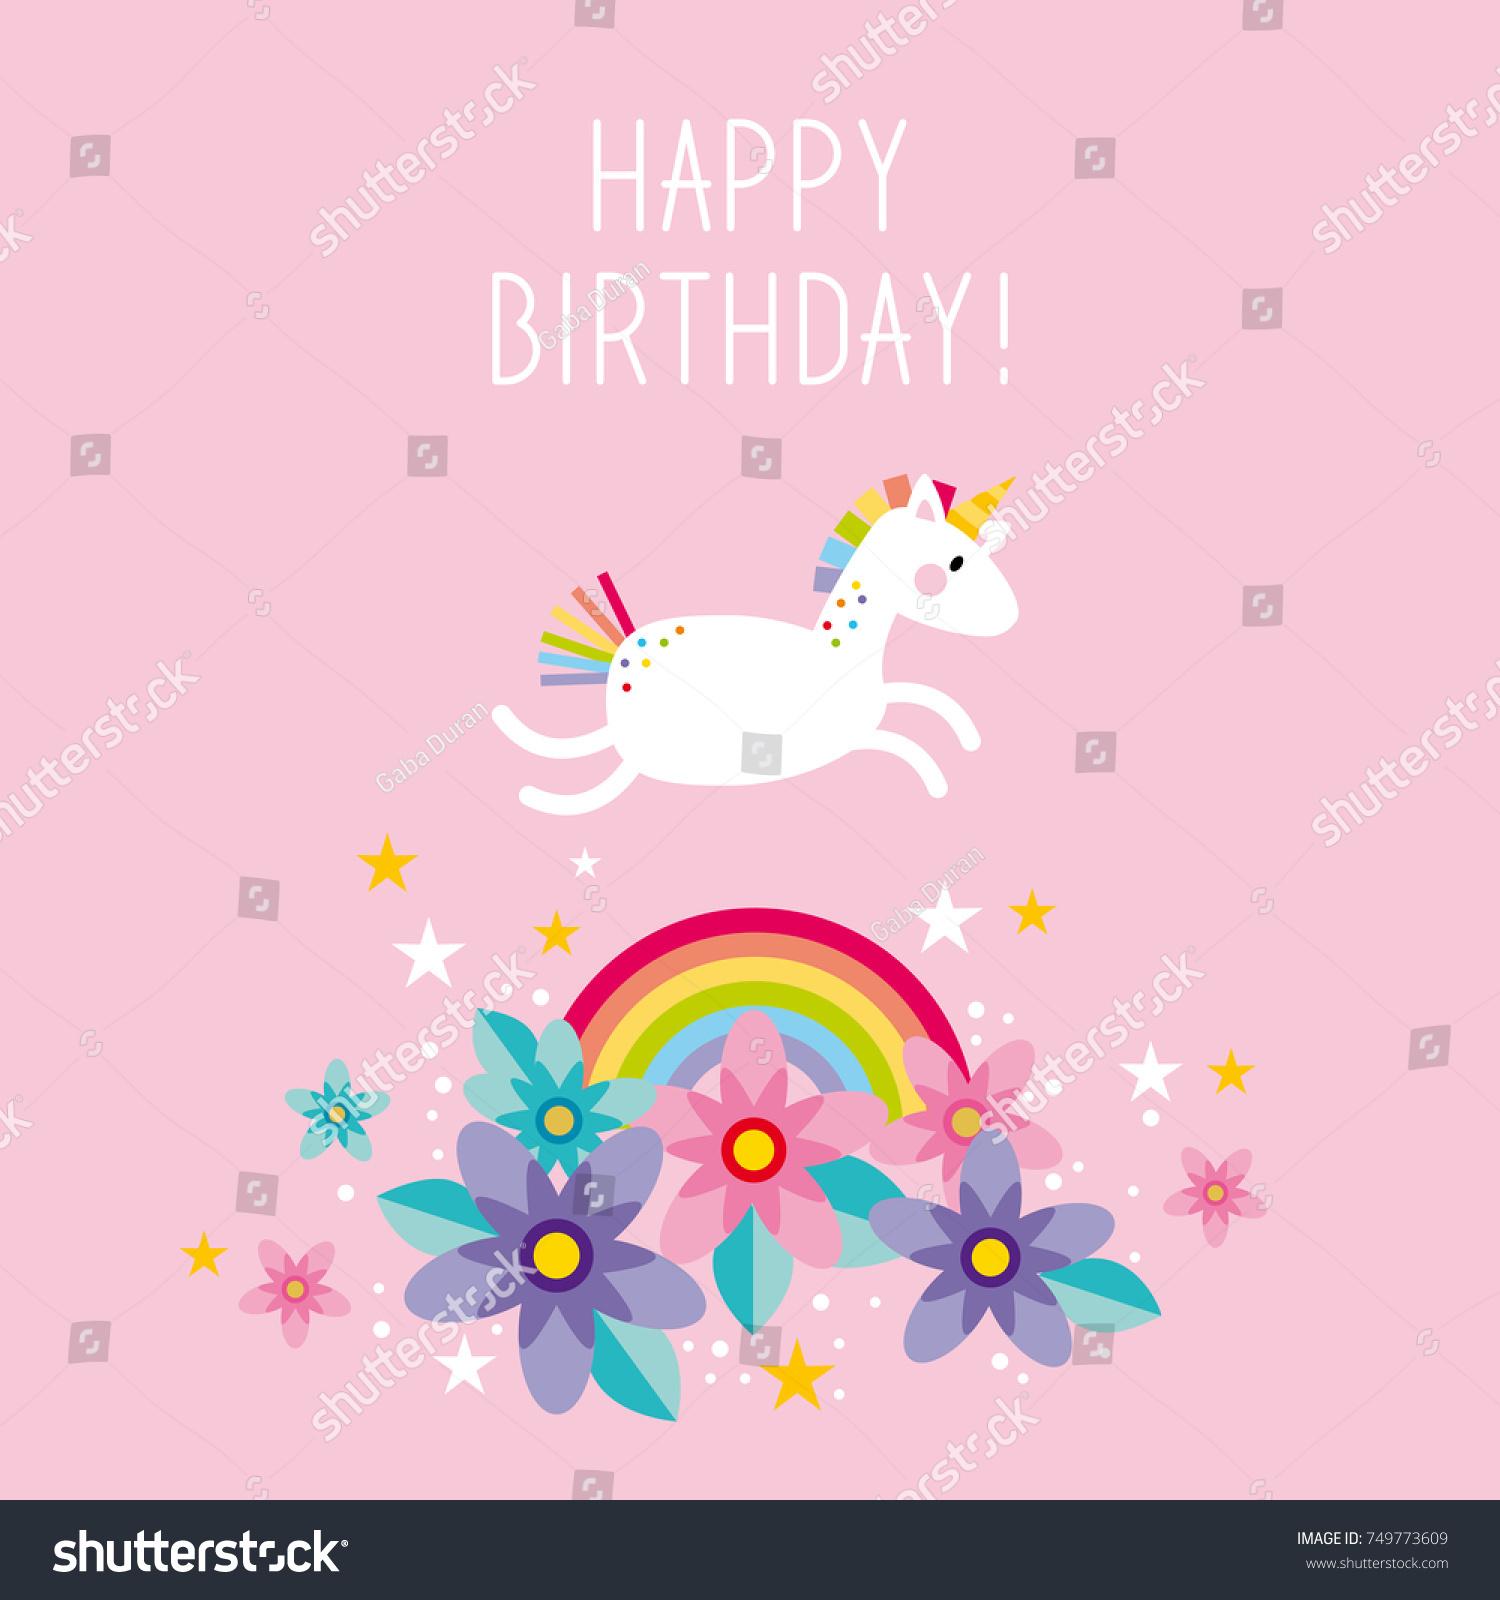 Unicorn Rainbow Happy Birthday Card Invitation Image Vectorielle De